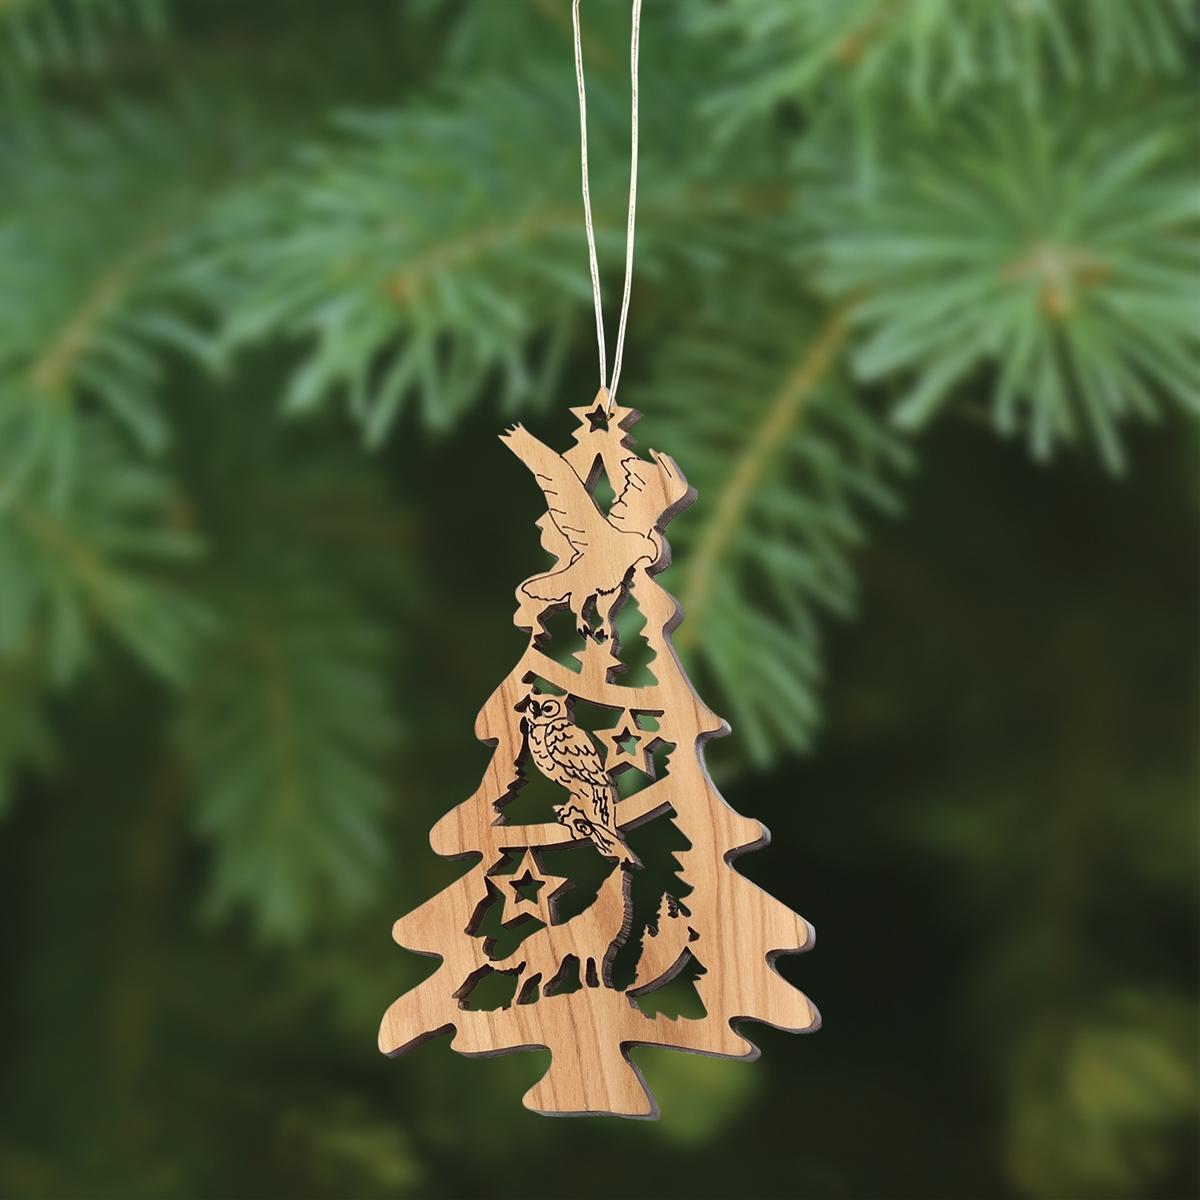 Wildlife Tree Ornament